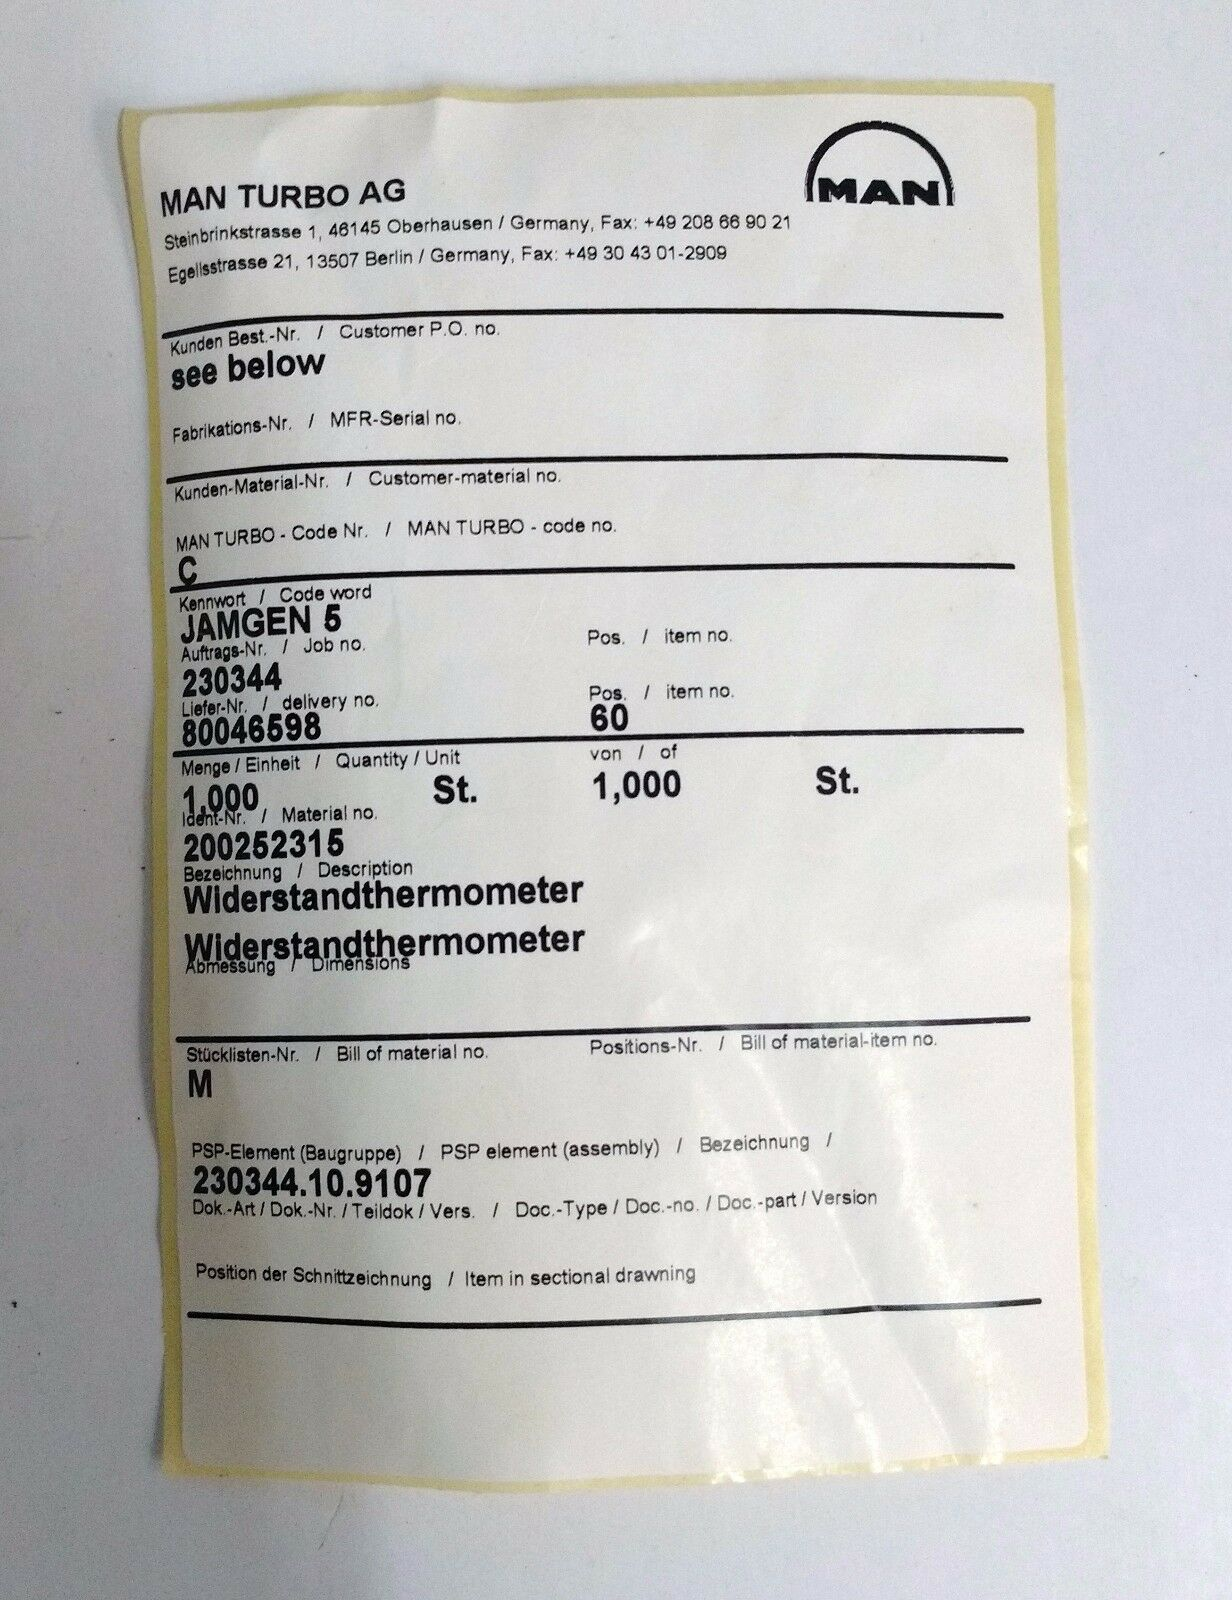 Rosemount 31.159.414 / Man Turbo AG 200252315 Resistance Thermometer ...